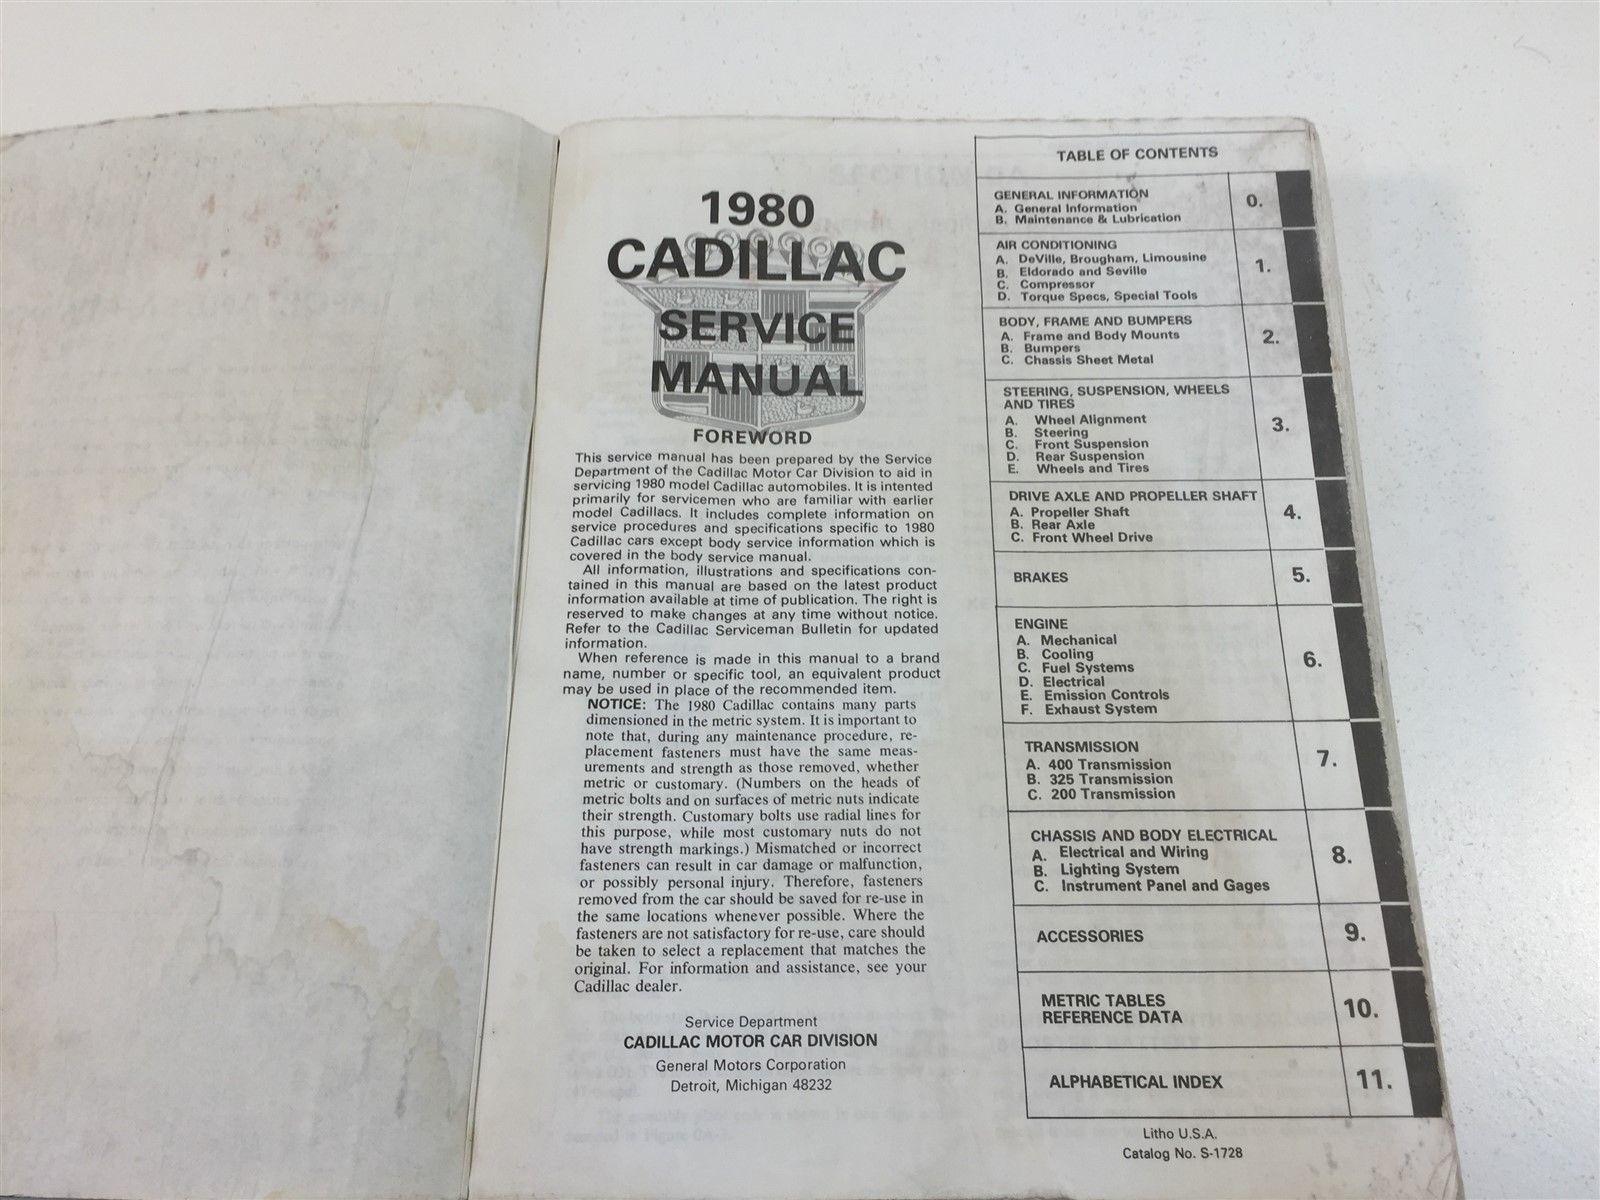 1980 Cadillac Nineteen Hundred & Eighty Service Manual S-1728